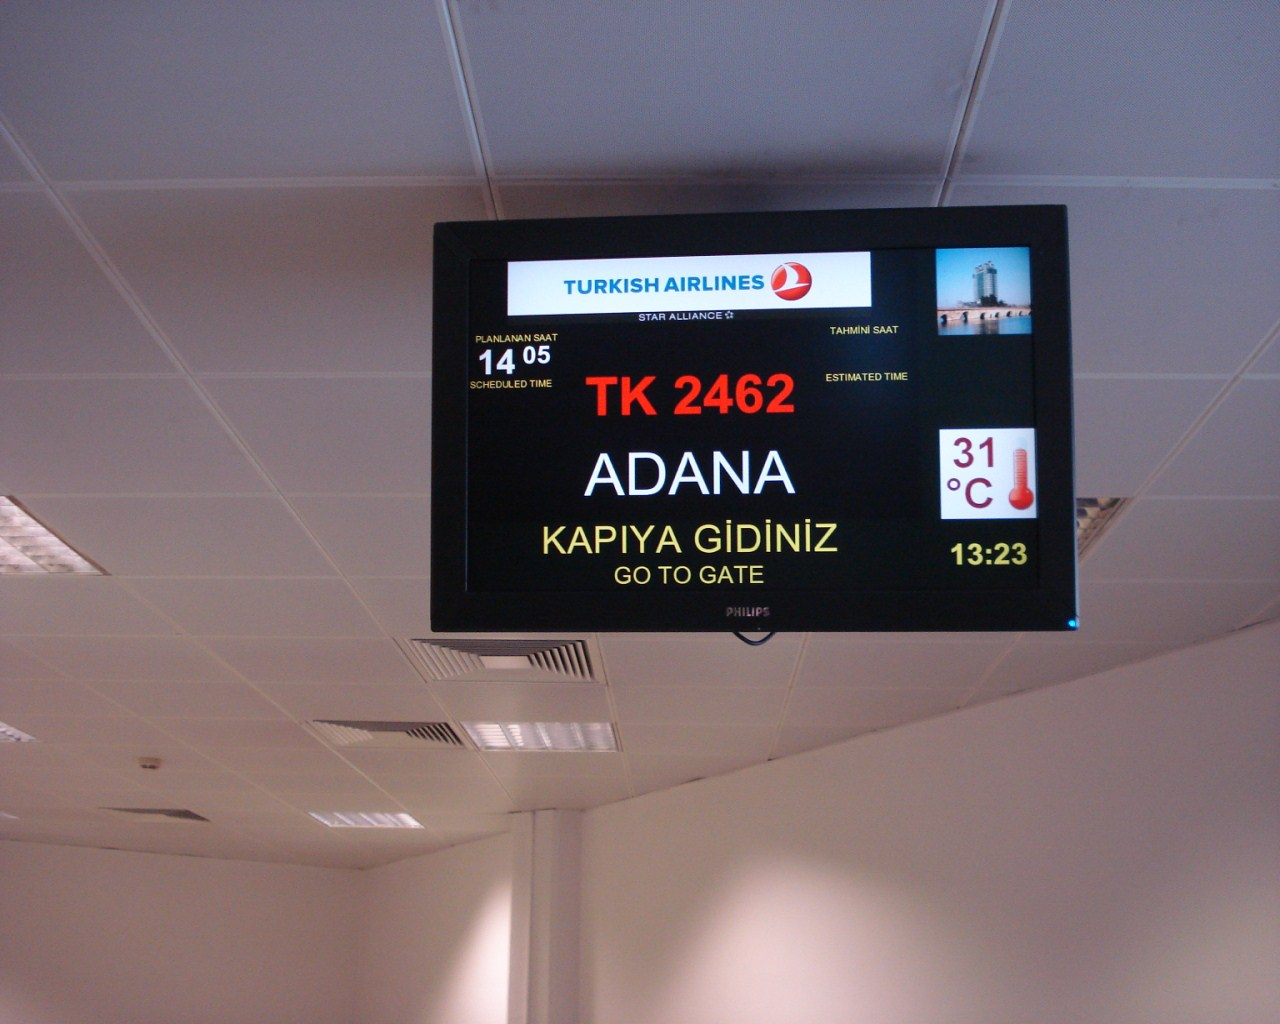 Посадка на рейс Стамбул-Адана Турецких авиалиний